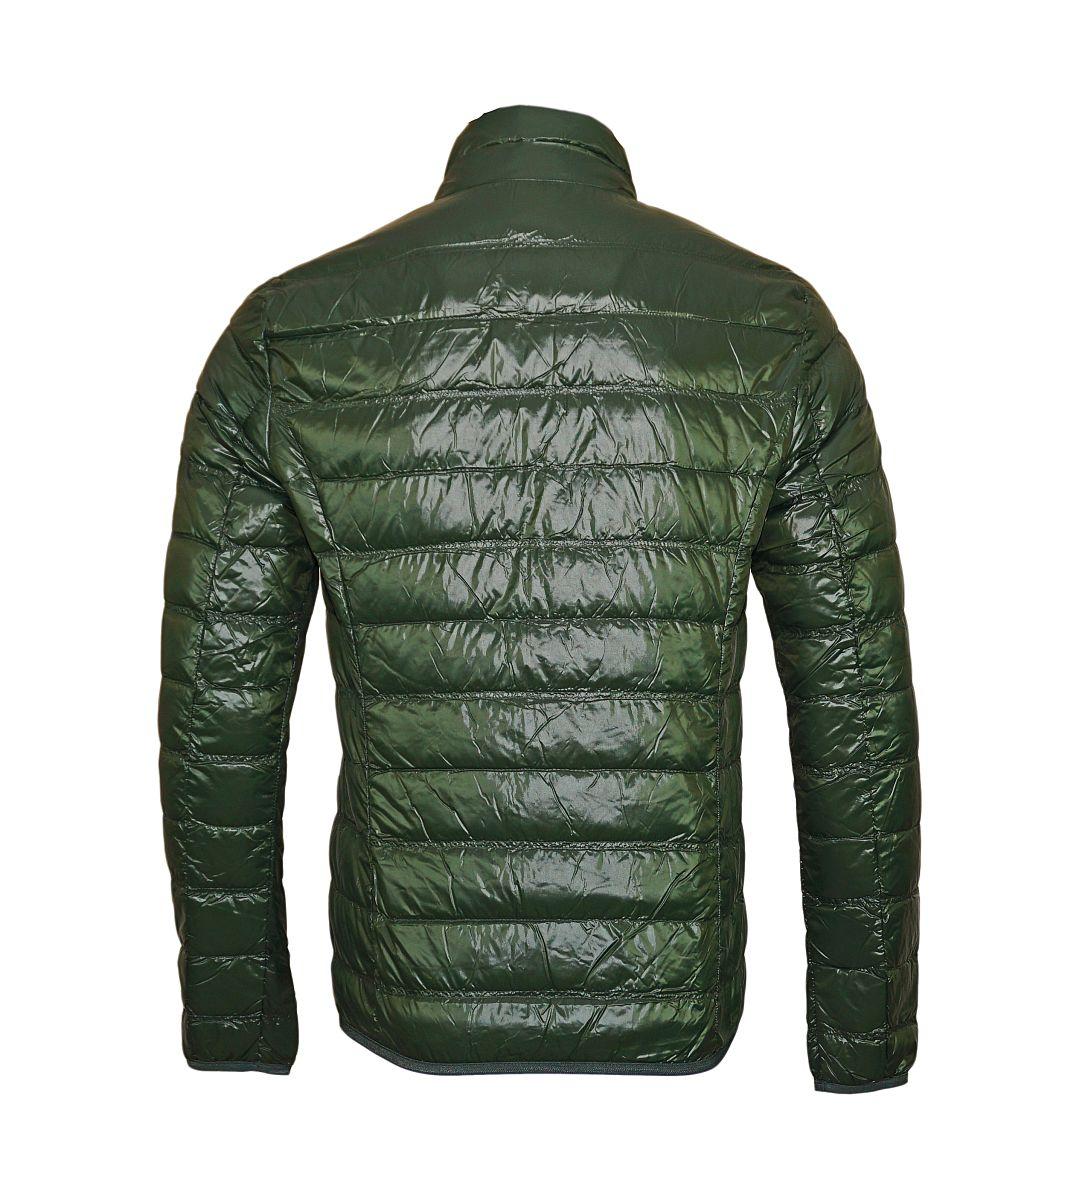 EA7 Emporio Armani Down Jacket Daunenjacke 8NPB01 PN29Z 1858 Deep Forest SH17-EA7J1